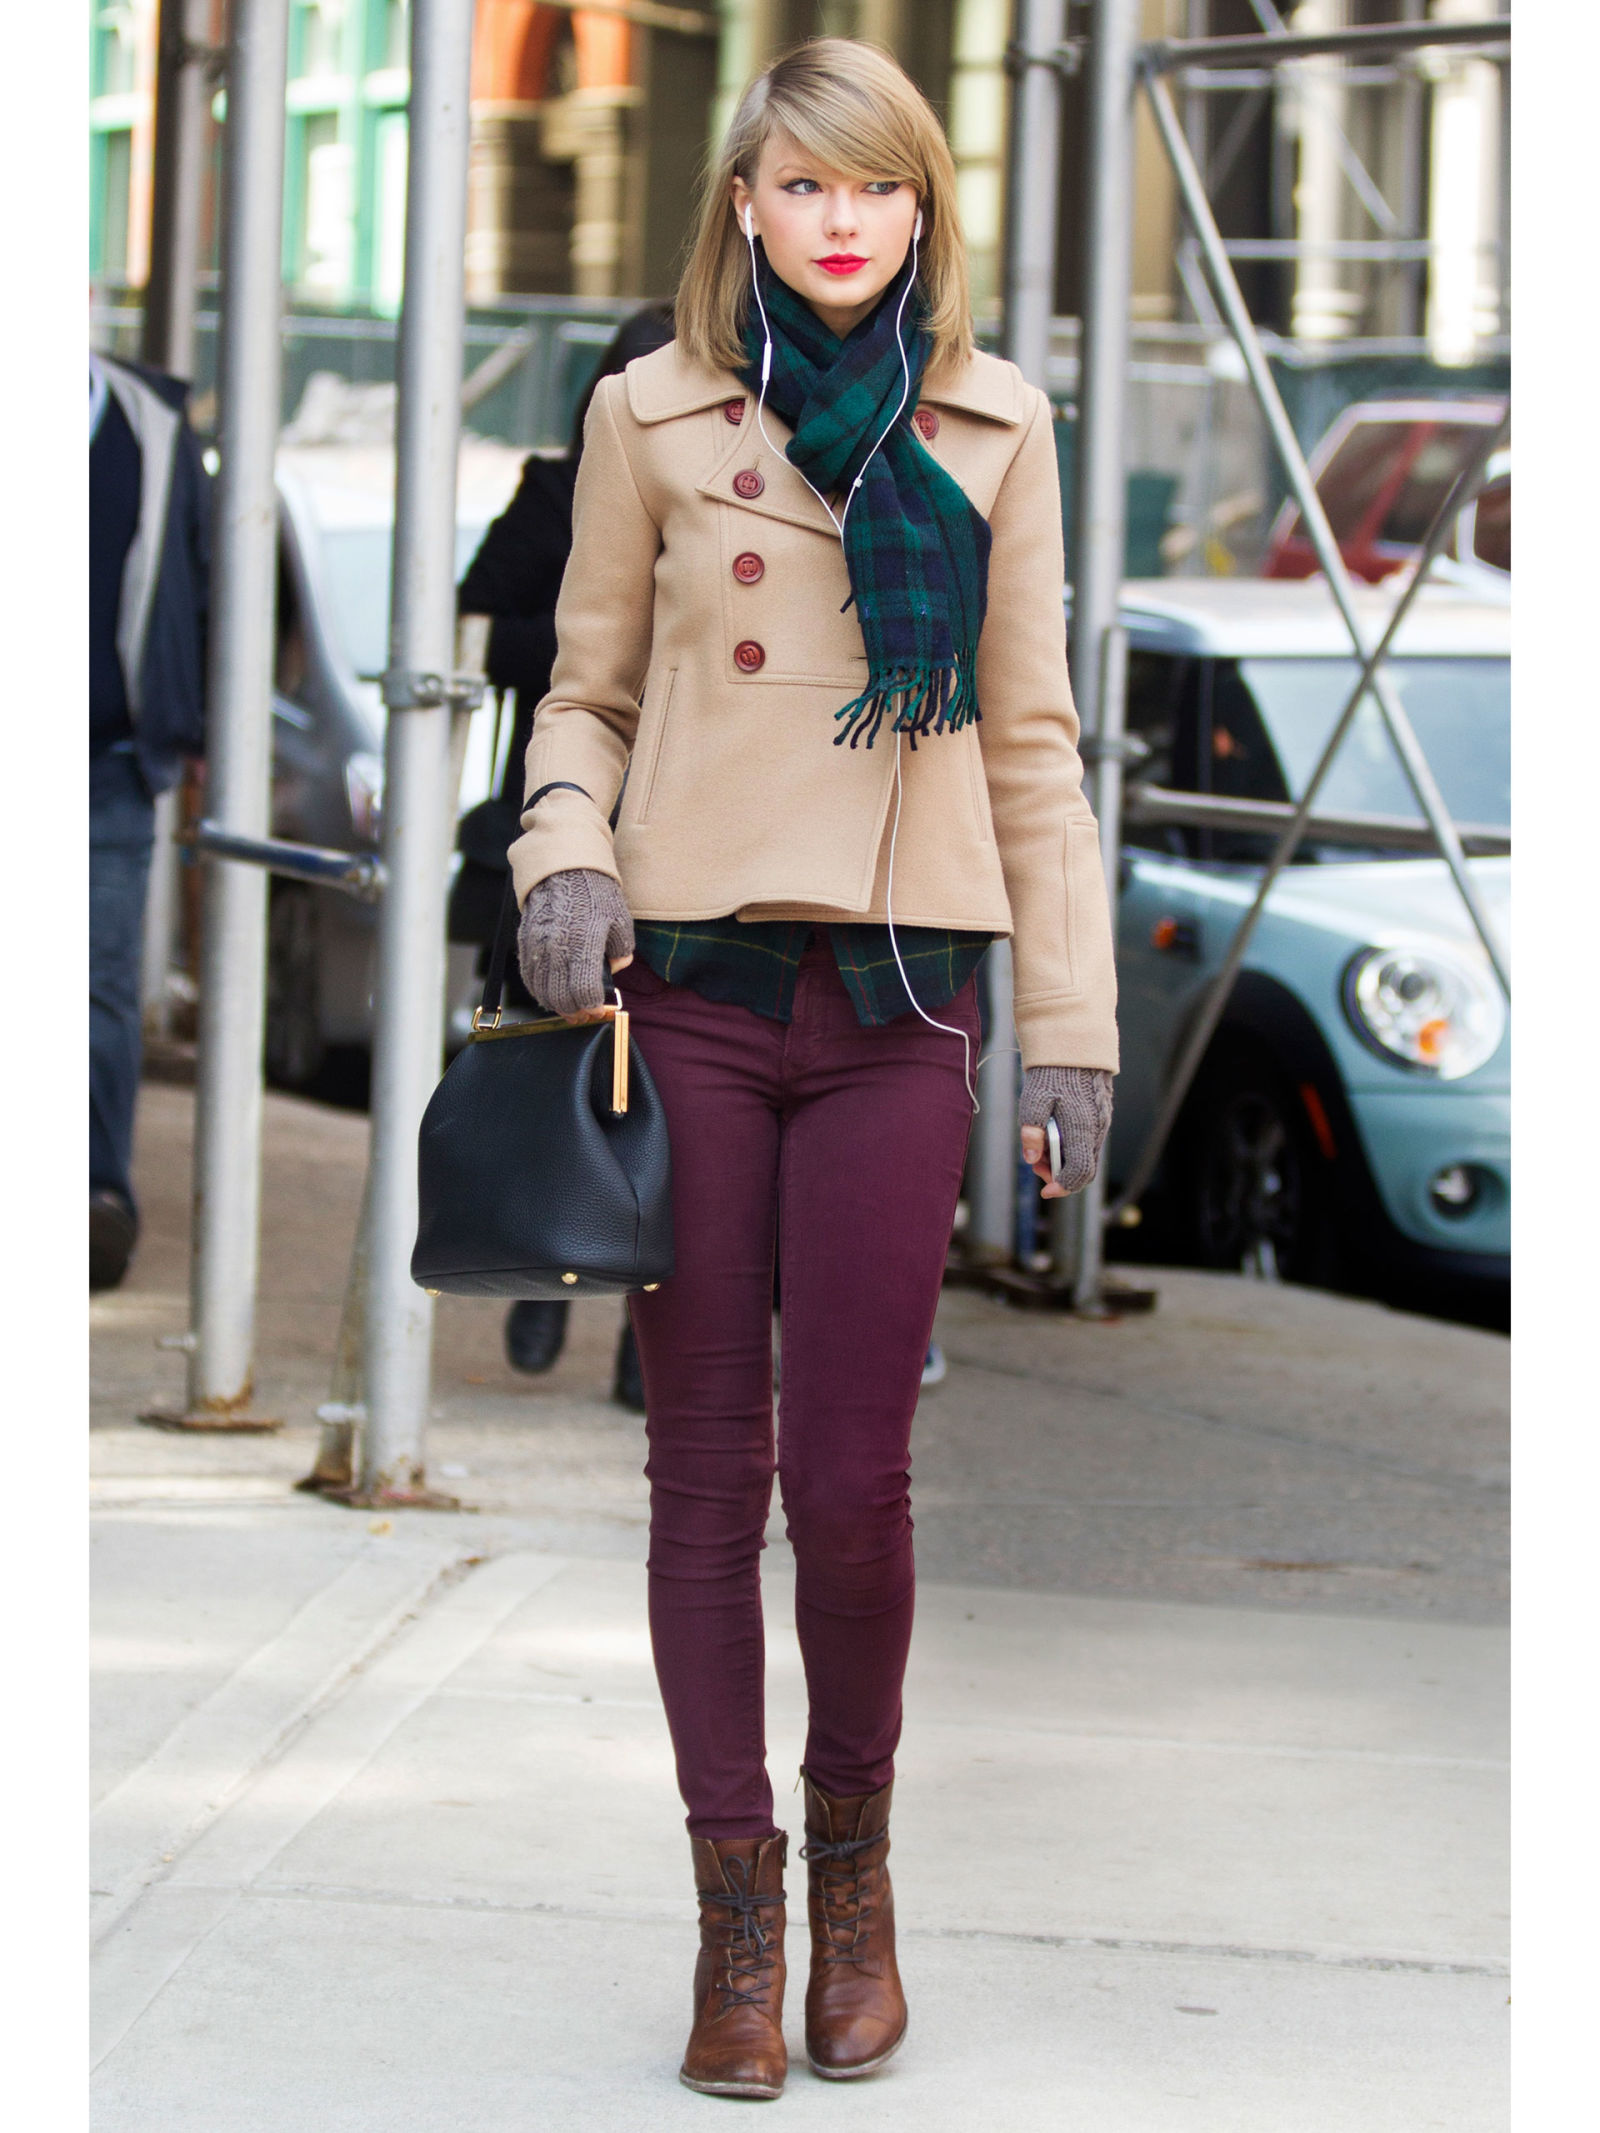 Classic Peacoat Styles - Classic Fashion